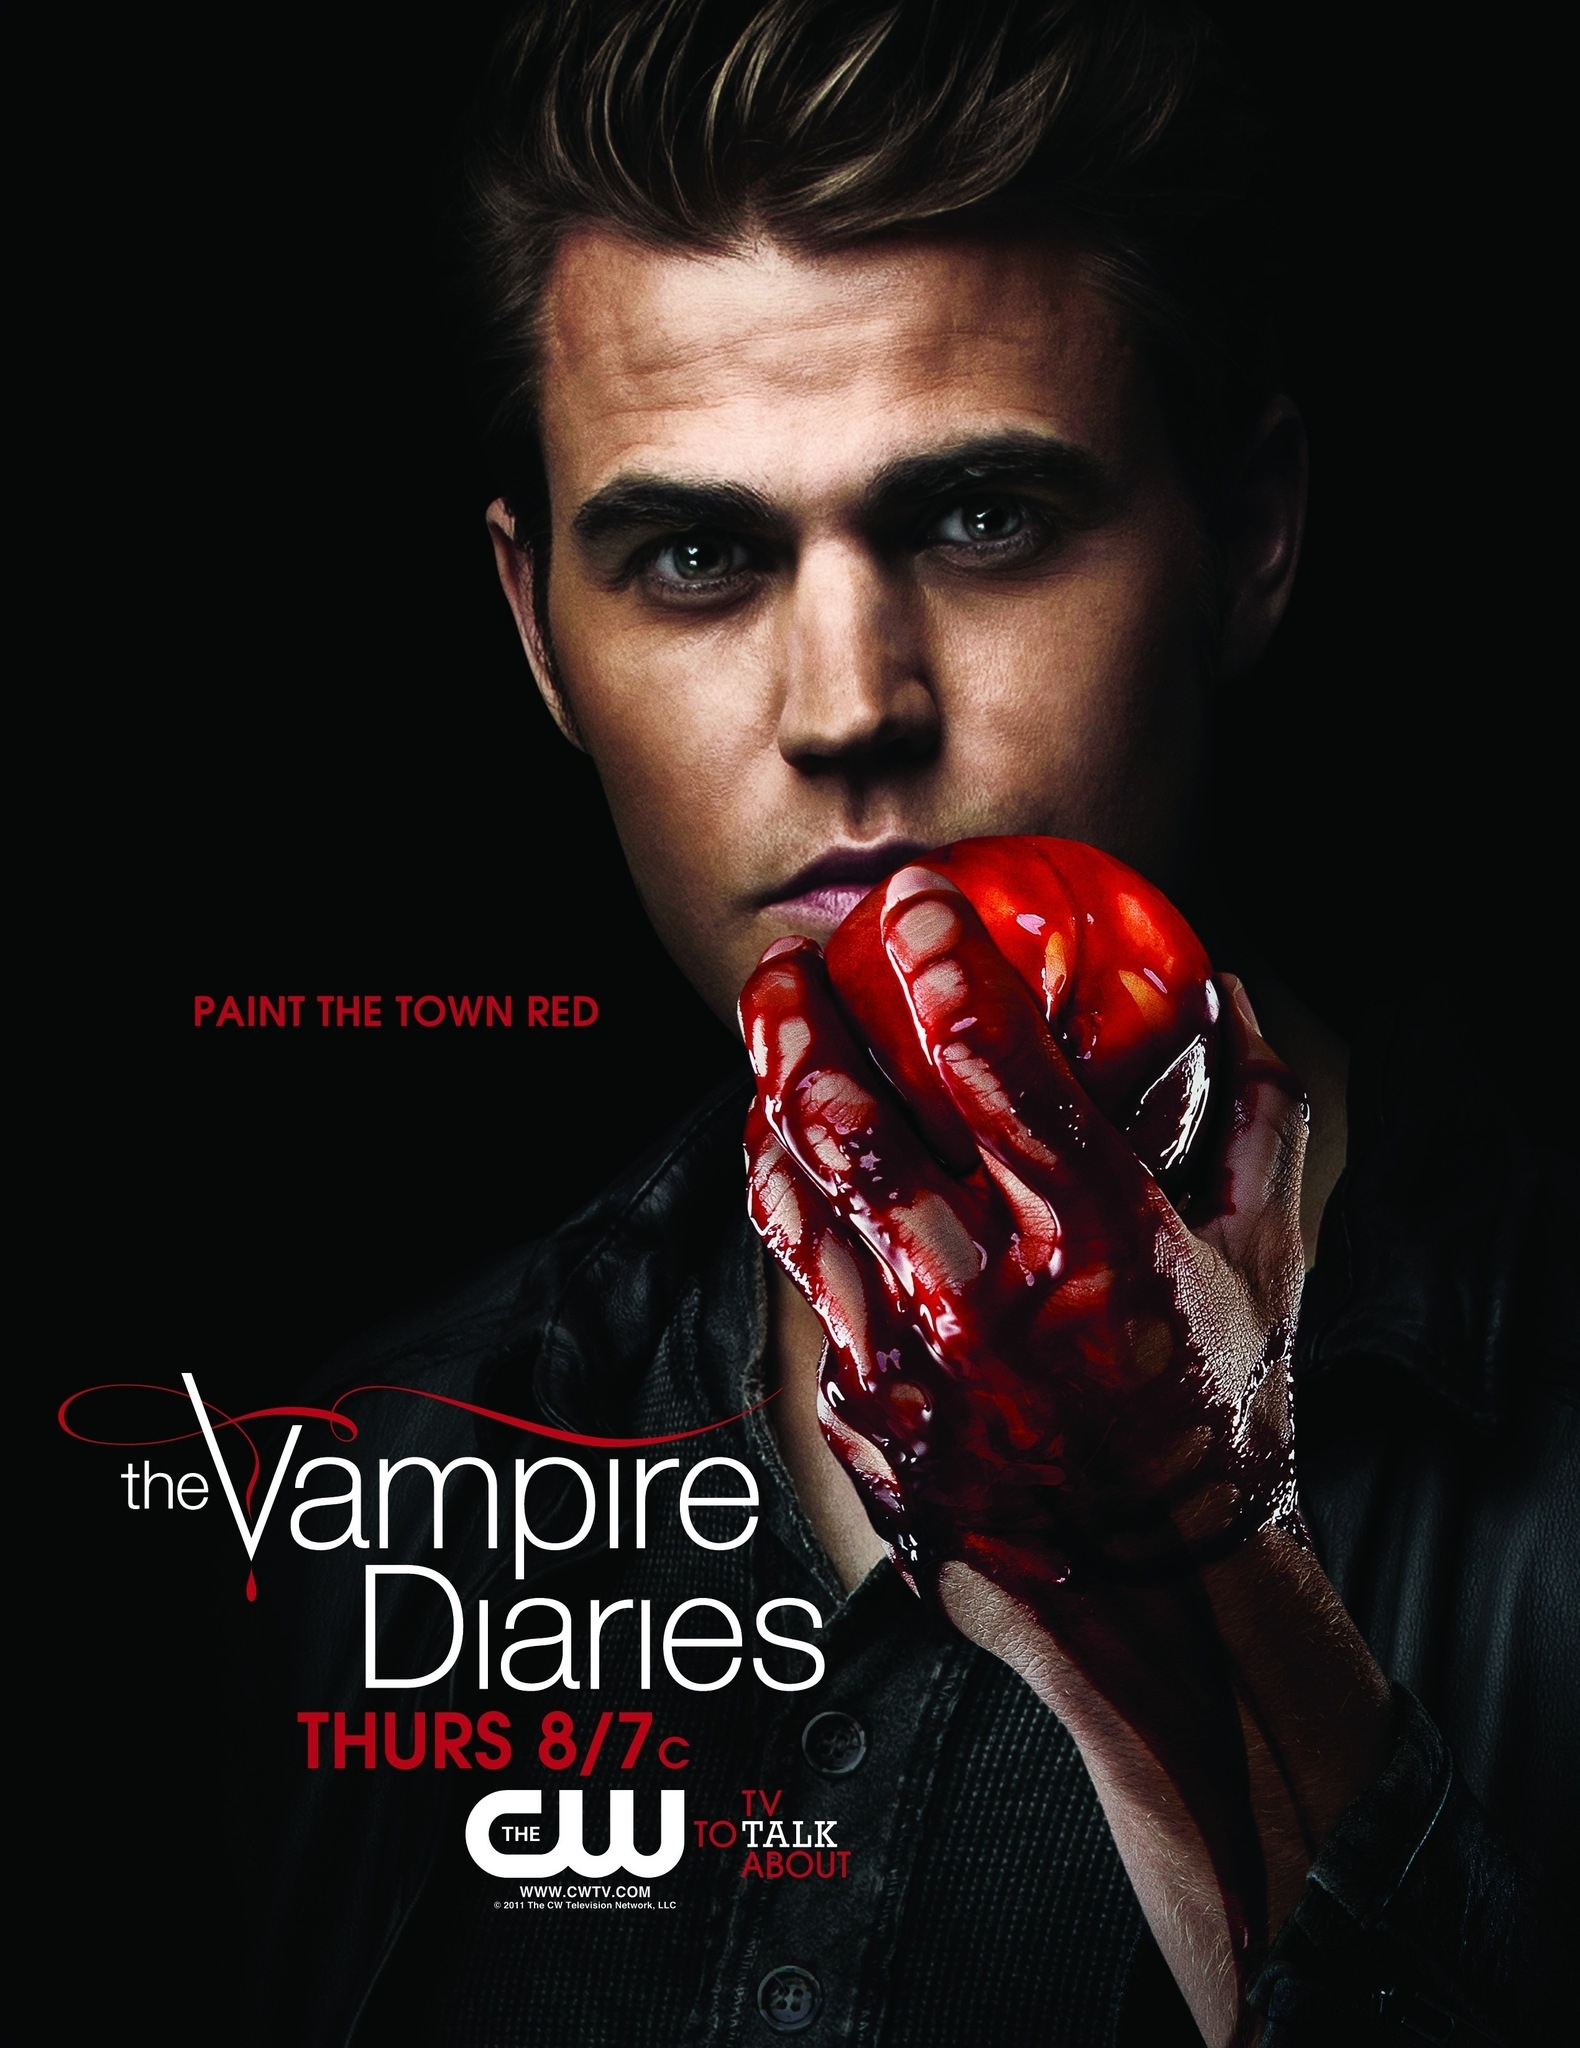 sexy vampire poster - photo #27